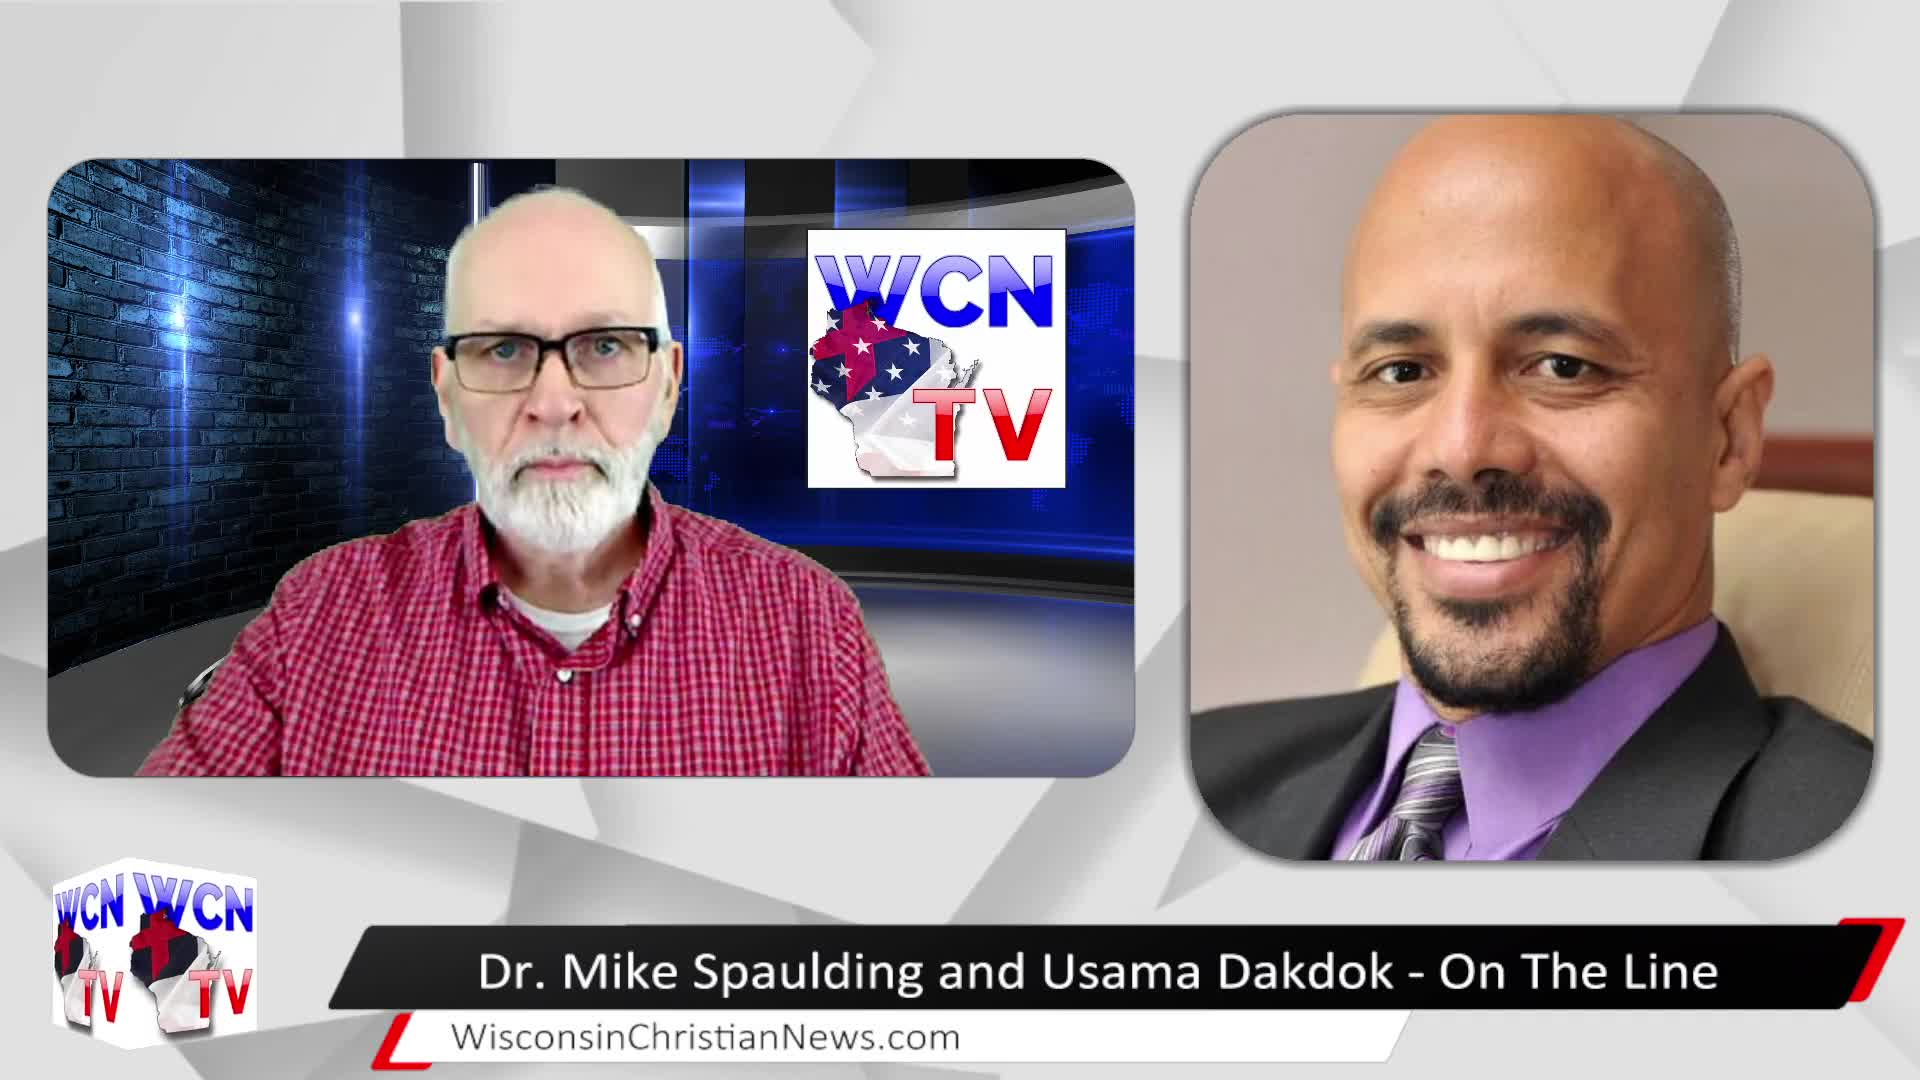 WCN-TV | September 15th, 2021 | Dr. Mike Spaulding and Usama DakDok